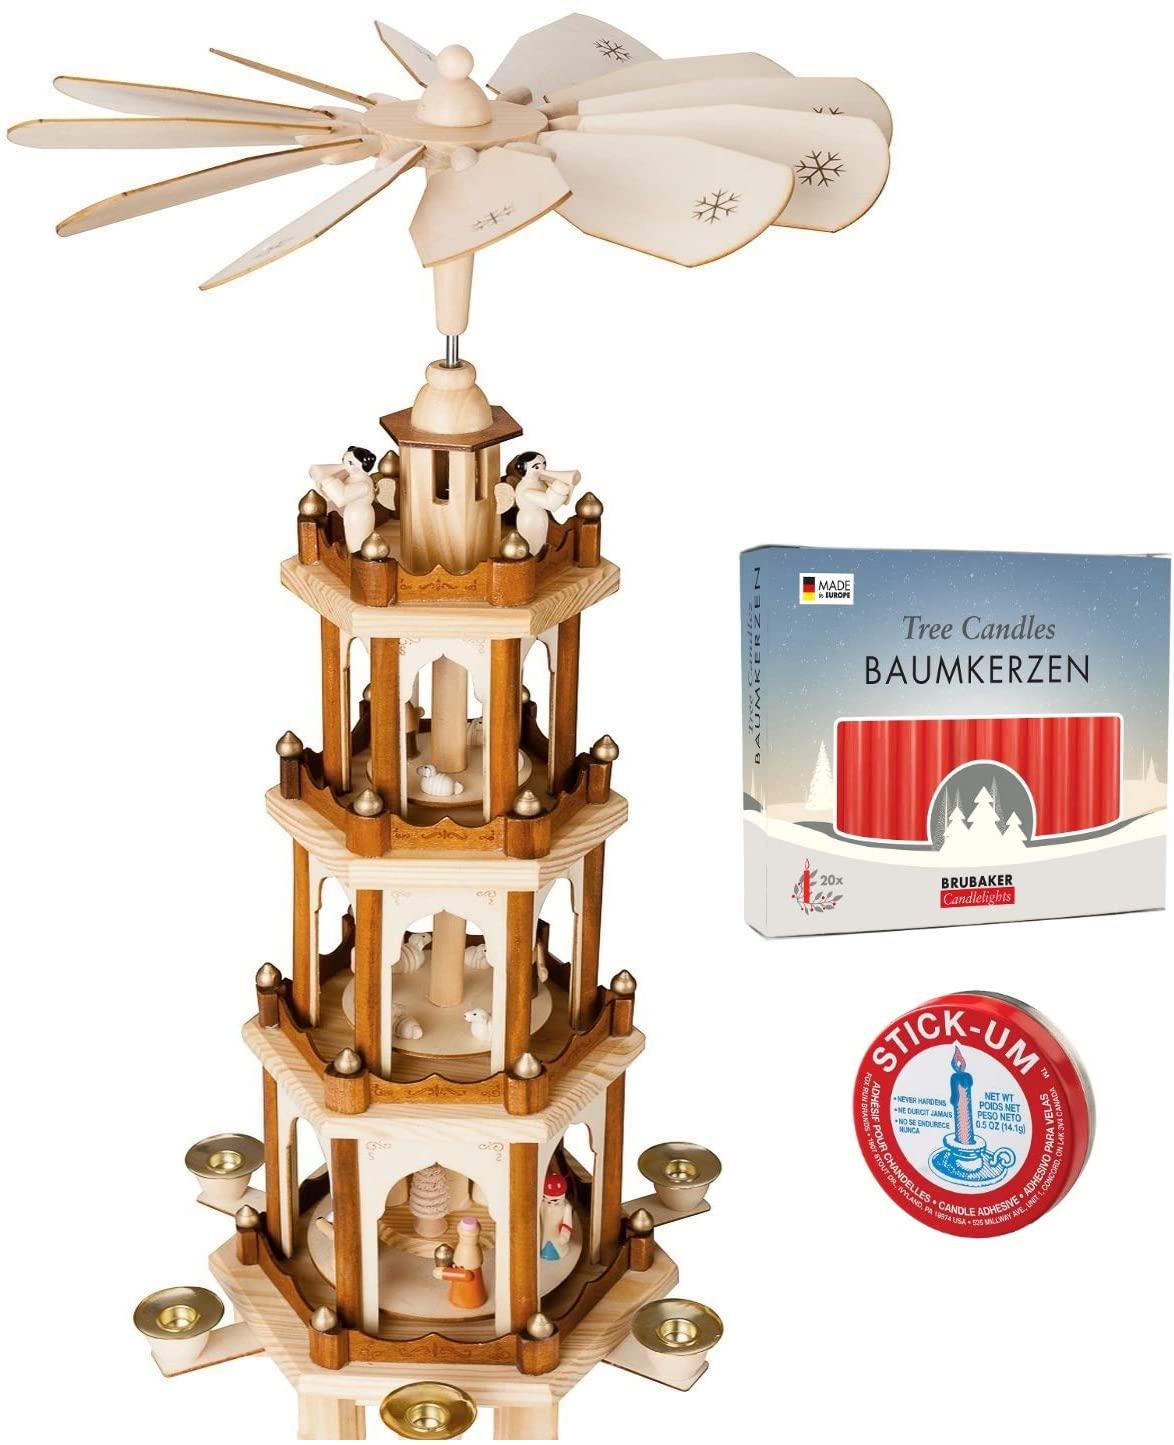 BRUBAKER 크리스마스 피라미드 4 계층 24 인치+20 빨간색 촛불+스틱 UM 촛불 접착제 세트